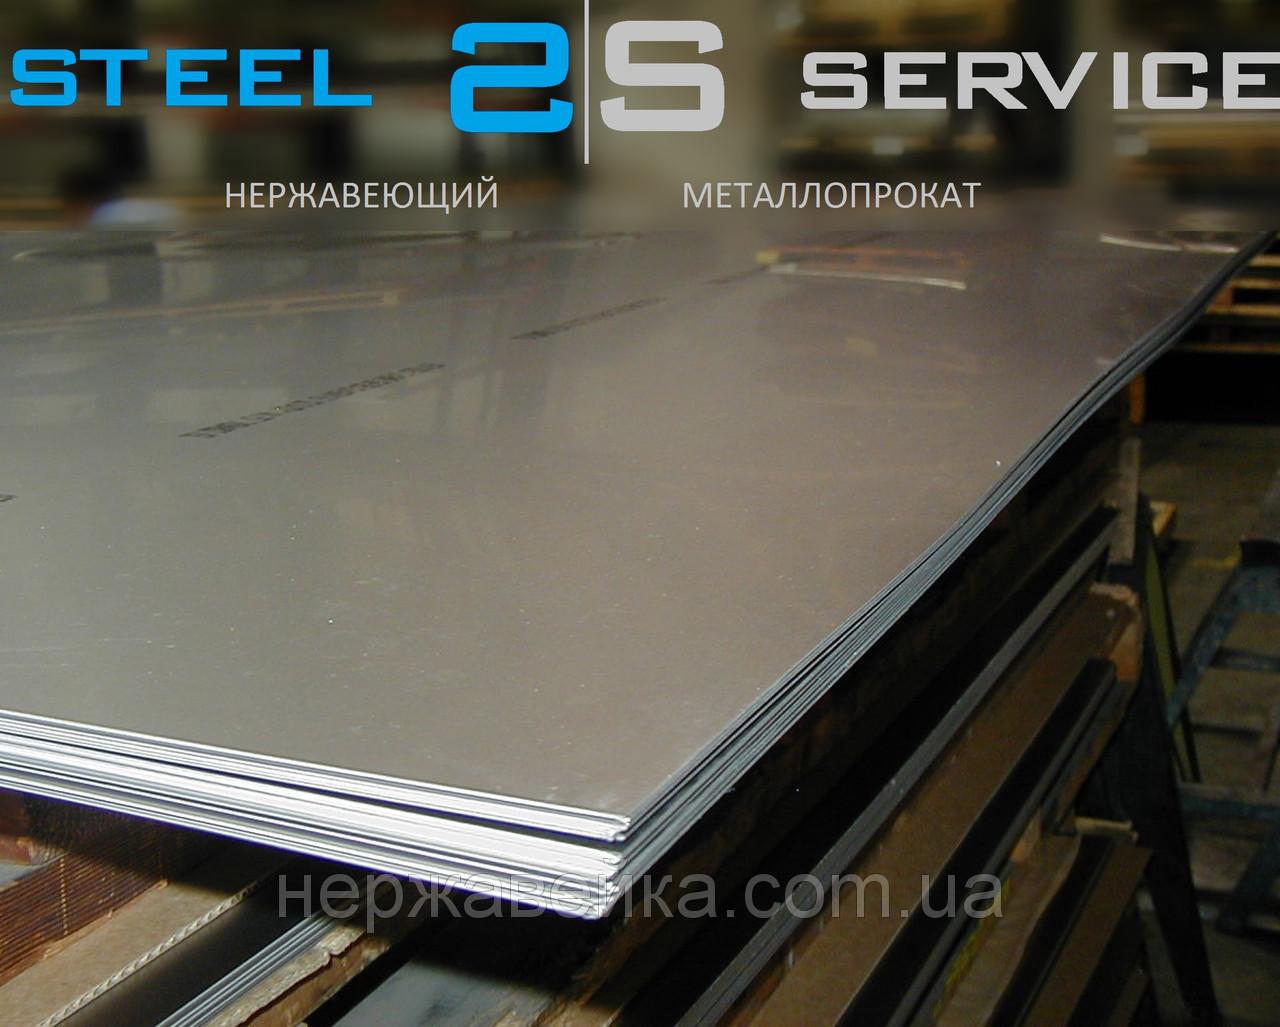 Нержавейка лист 0,8х1250х2500мм AISI 430(12Х17) 2B - матовый, технический